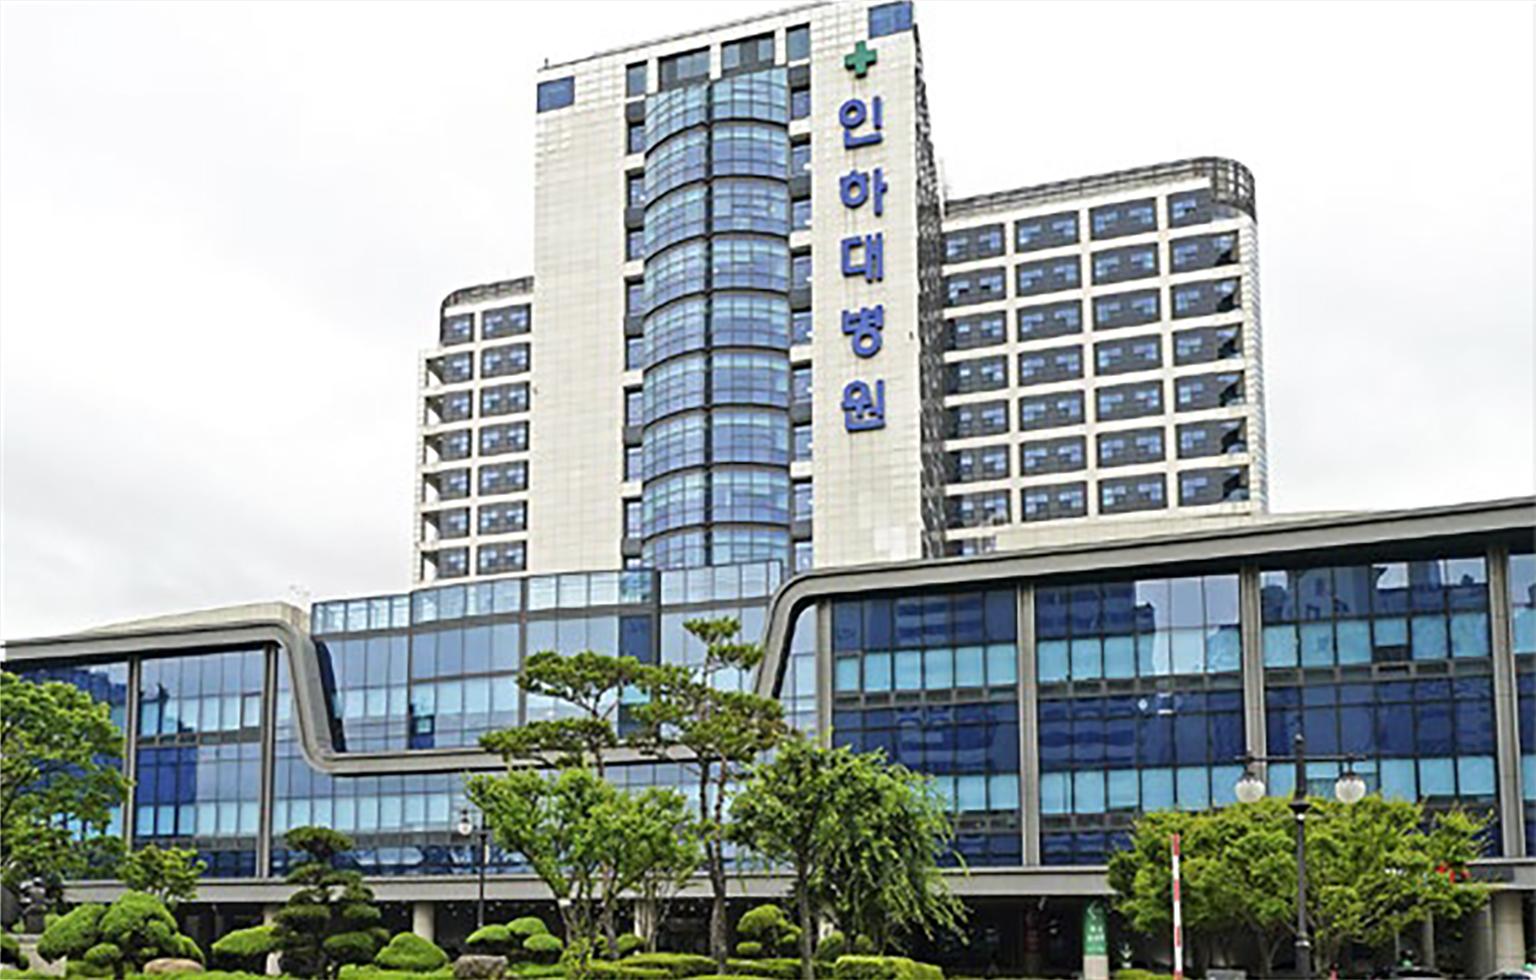 Inha University Hospital